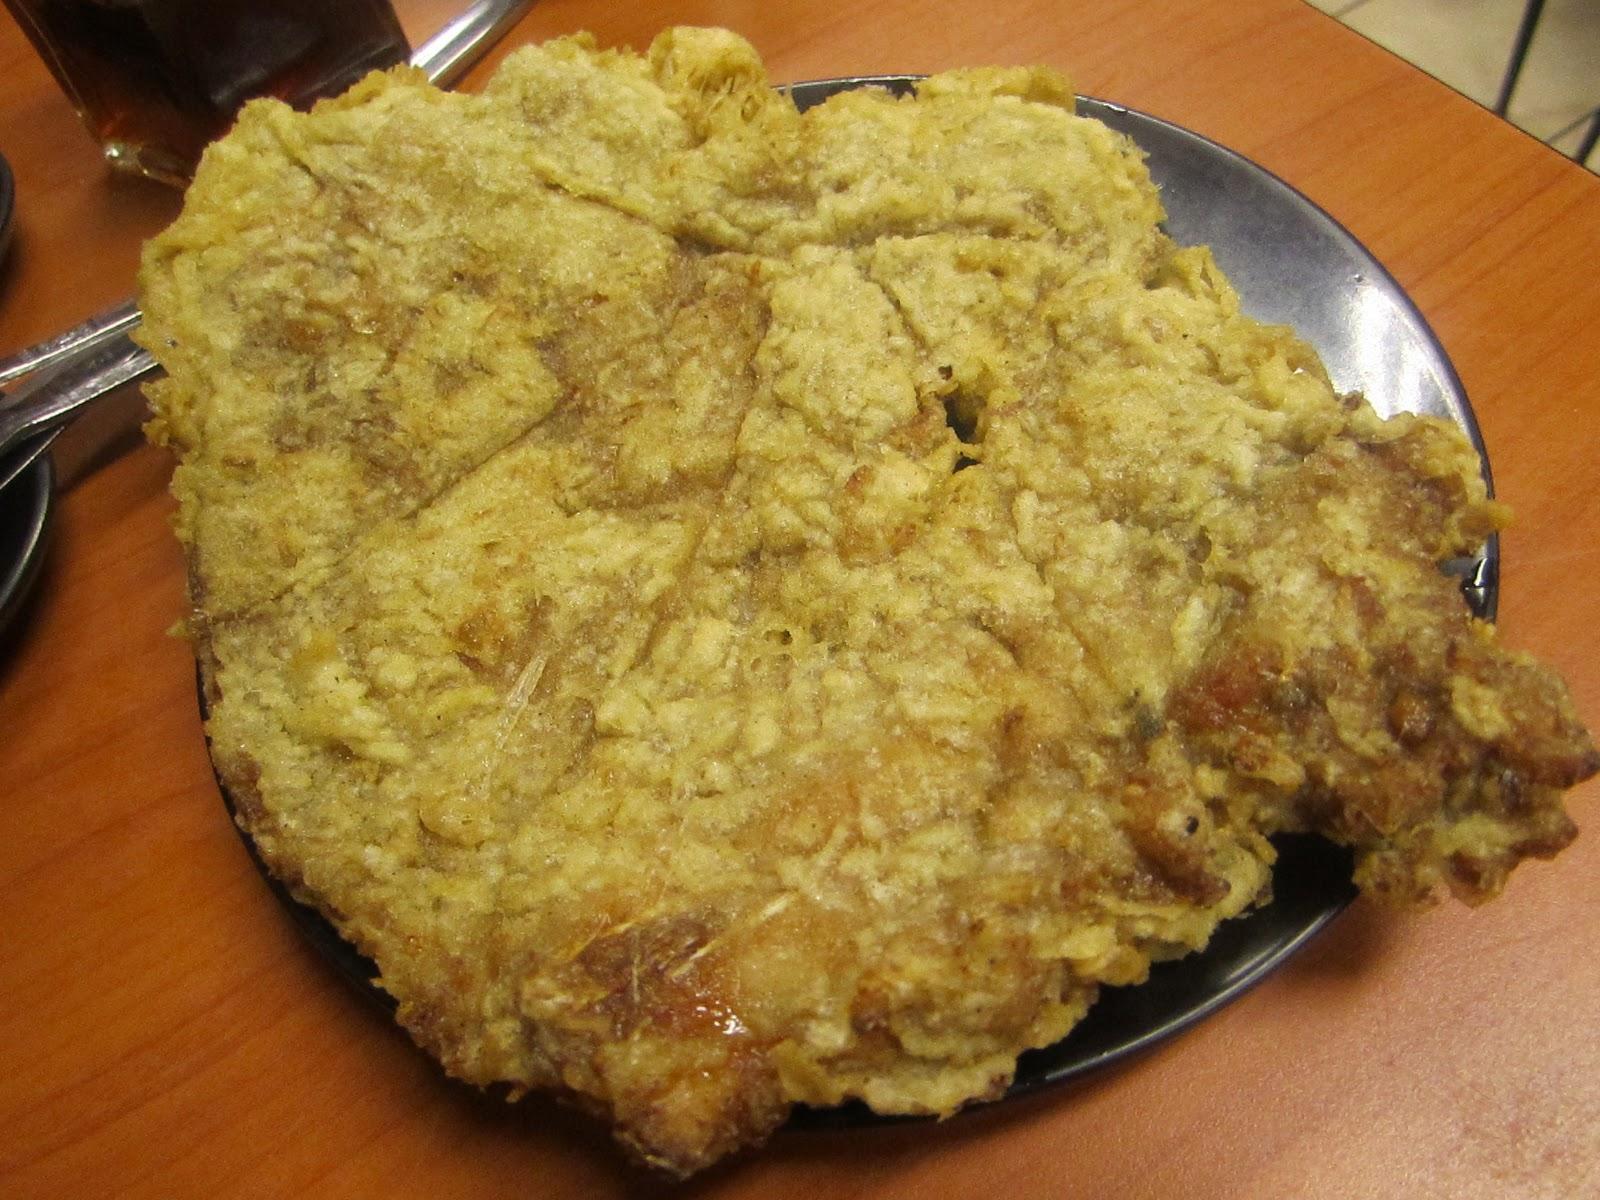 tasty dumplings pork chop recipe Tasty Dumplings, Tasty Porkchop!  BERYLLICIOUS- A Food, Lifestyle